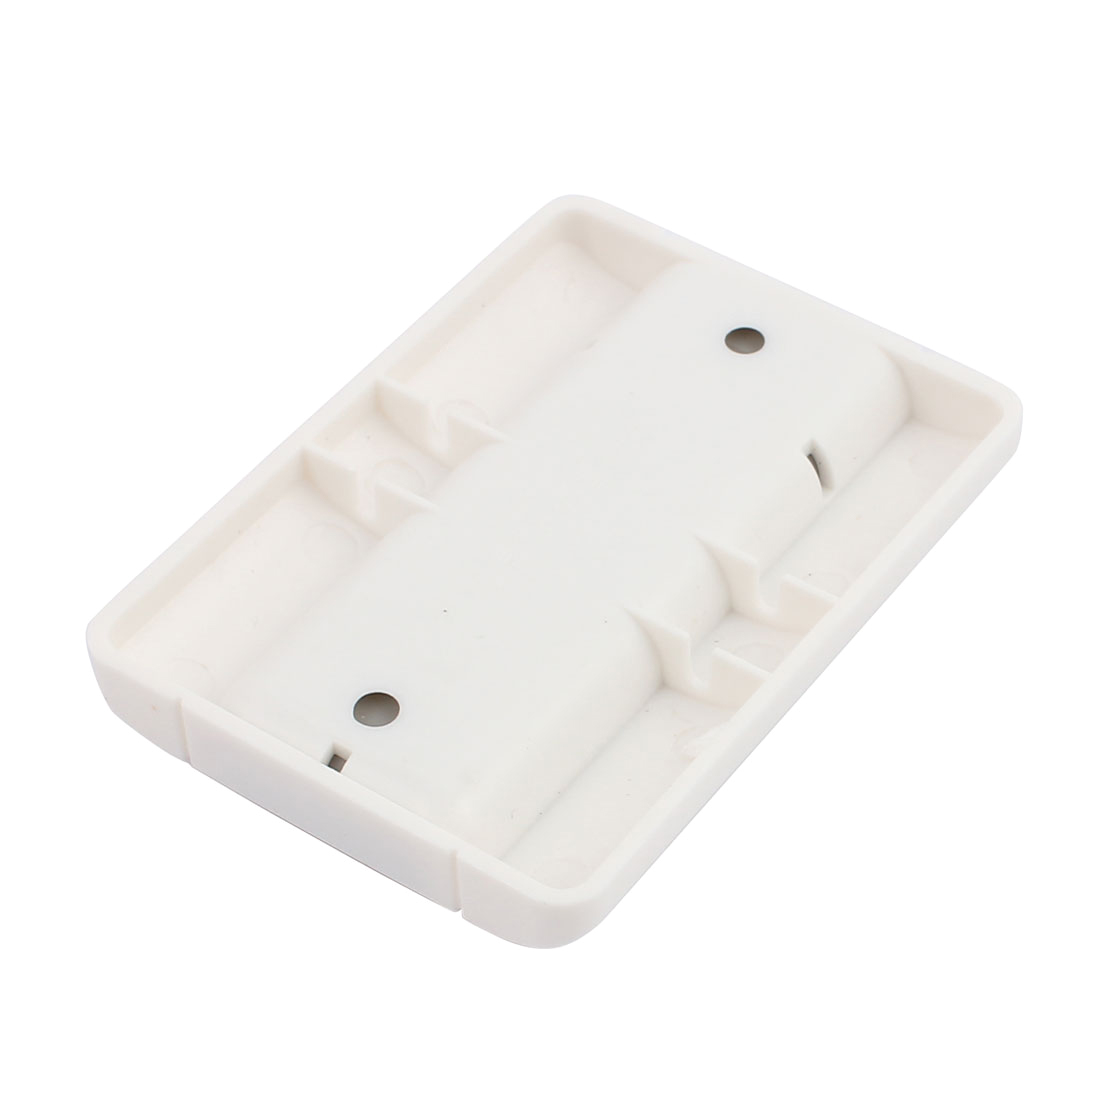 2pcs 100 Meters 2 Keys Plastic Shell Battery Powered Remote Controller w Base - image 2 de 3